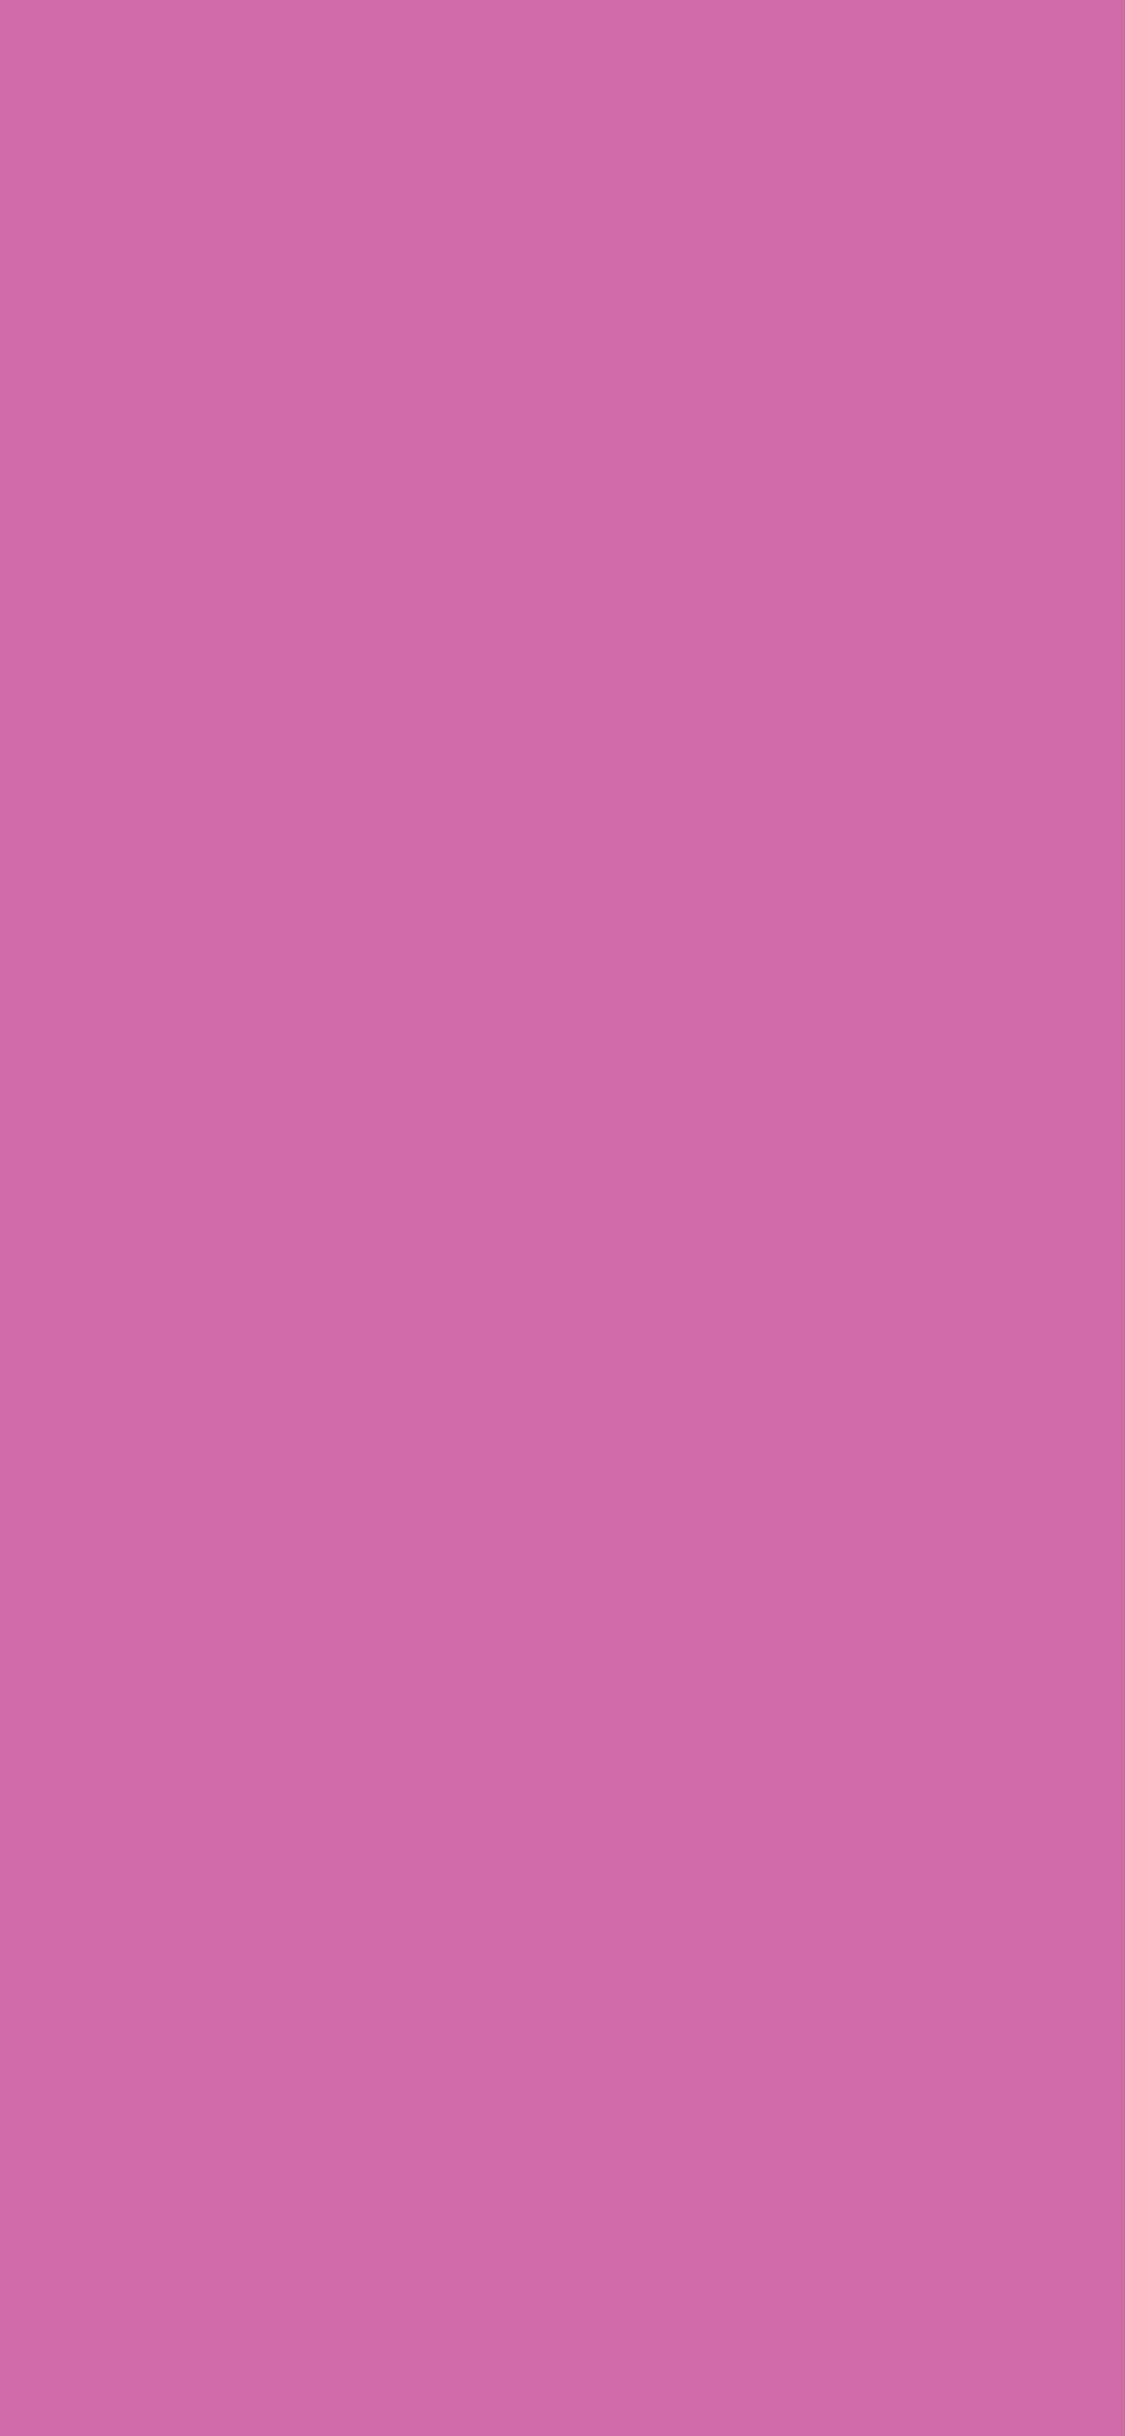 1125x2436 Super Pink Solid Color Background